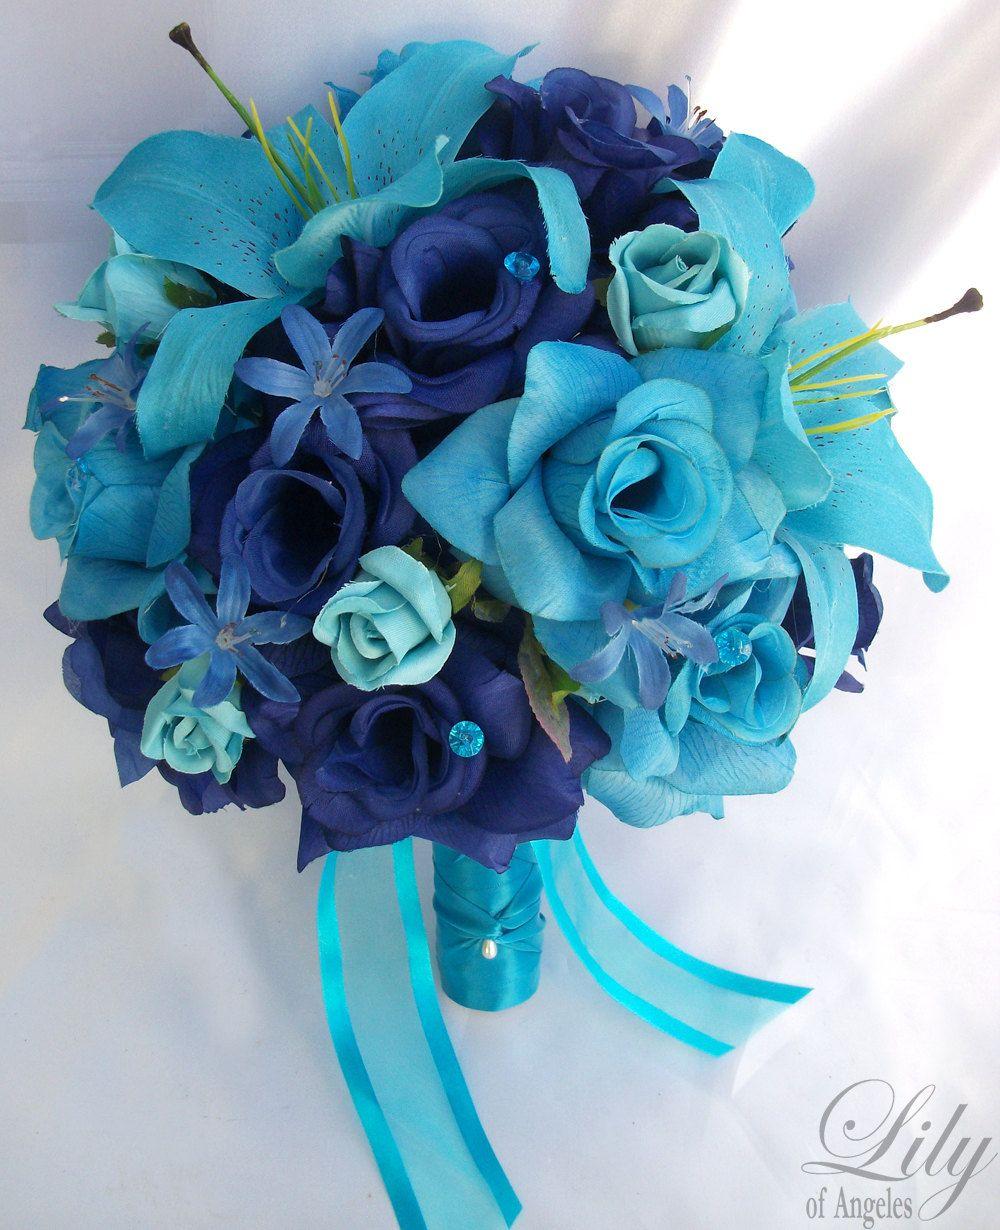 17pcs wedding bridal bouquet flower decoration bride package 17pcs wedding bridal bouquet flower decoration bride package turquoise blue lily 19999 via etsy izmirmasajfo Gallery